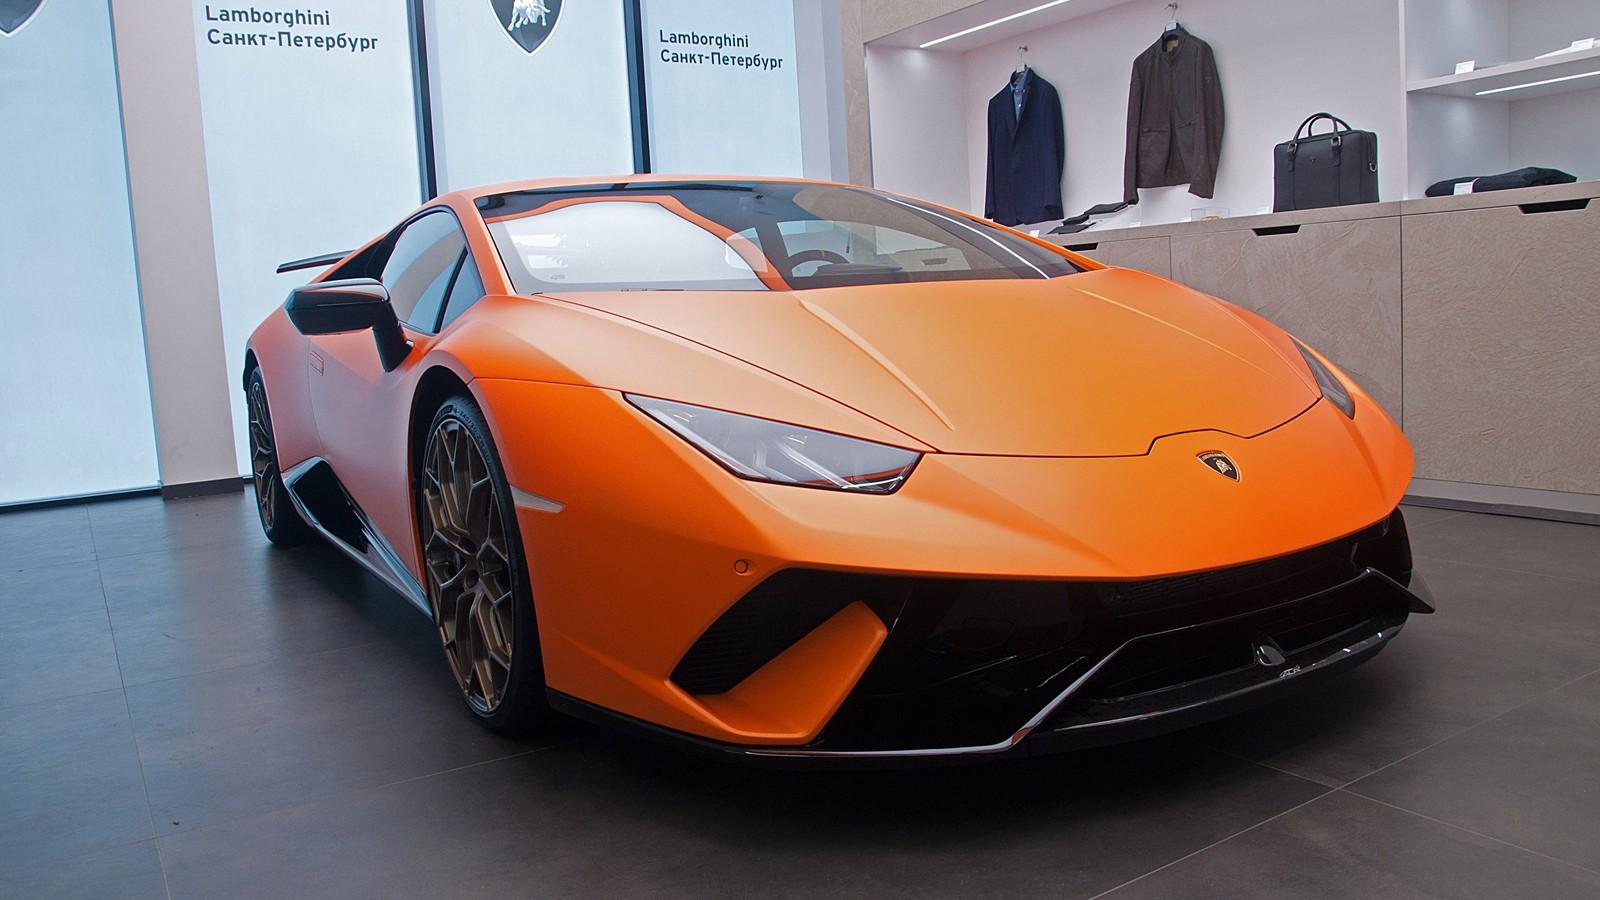 На фото: Lamborghini Huracan Performante